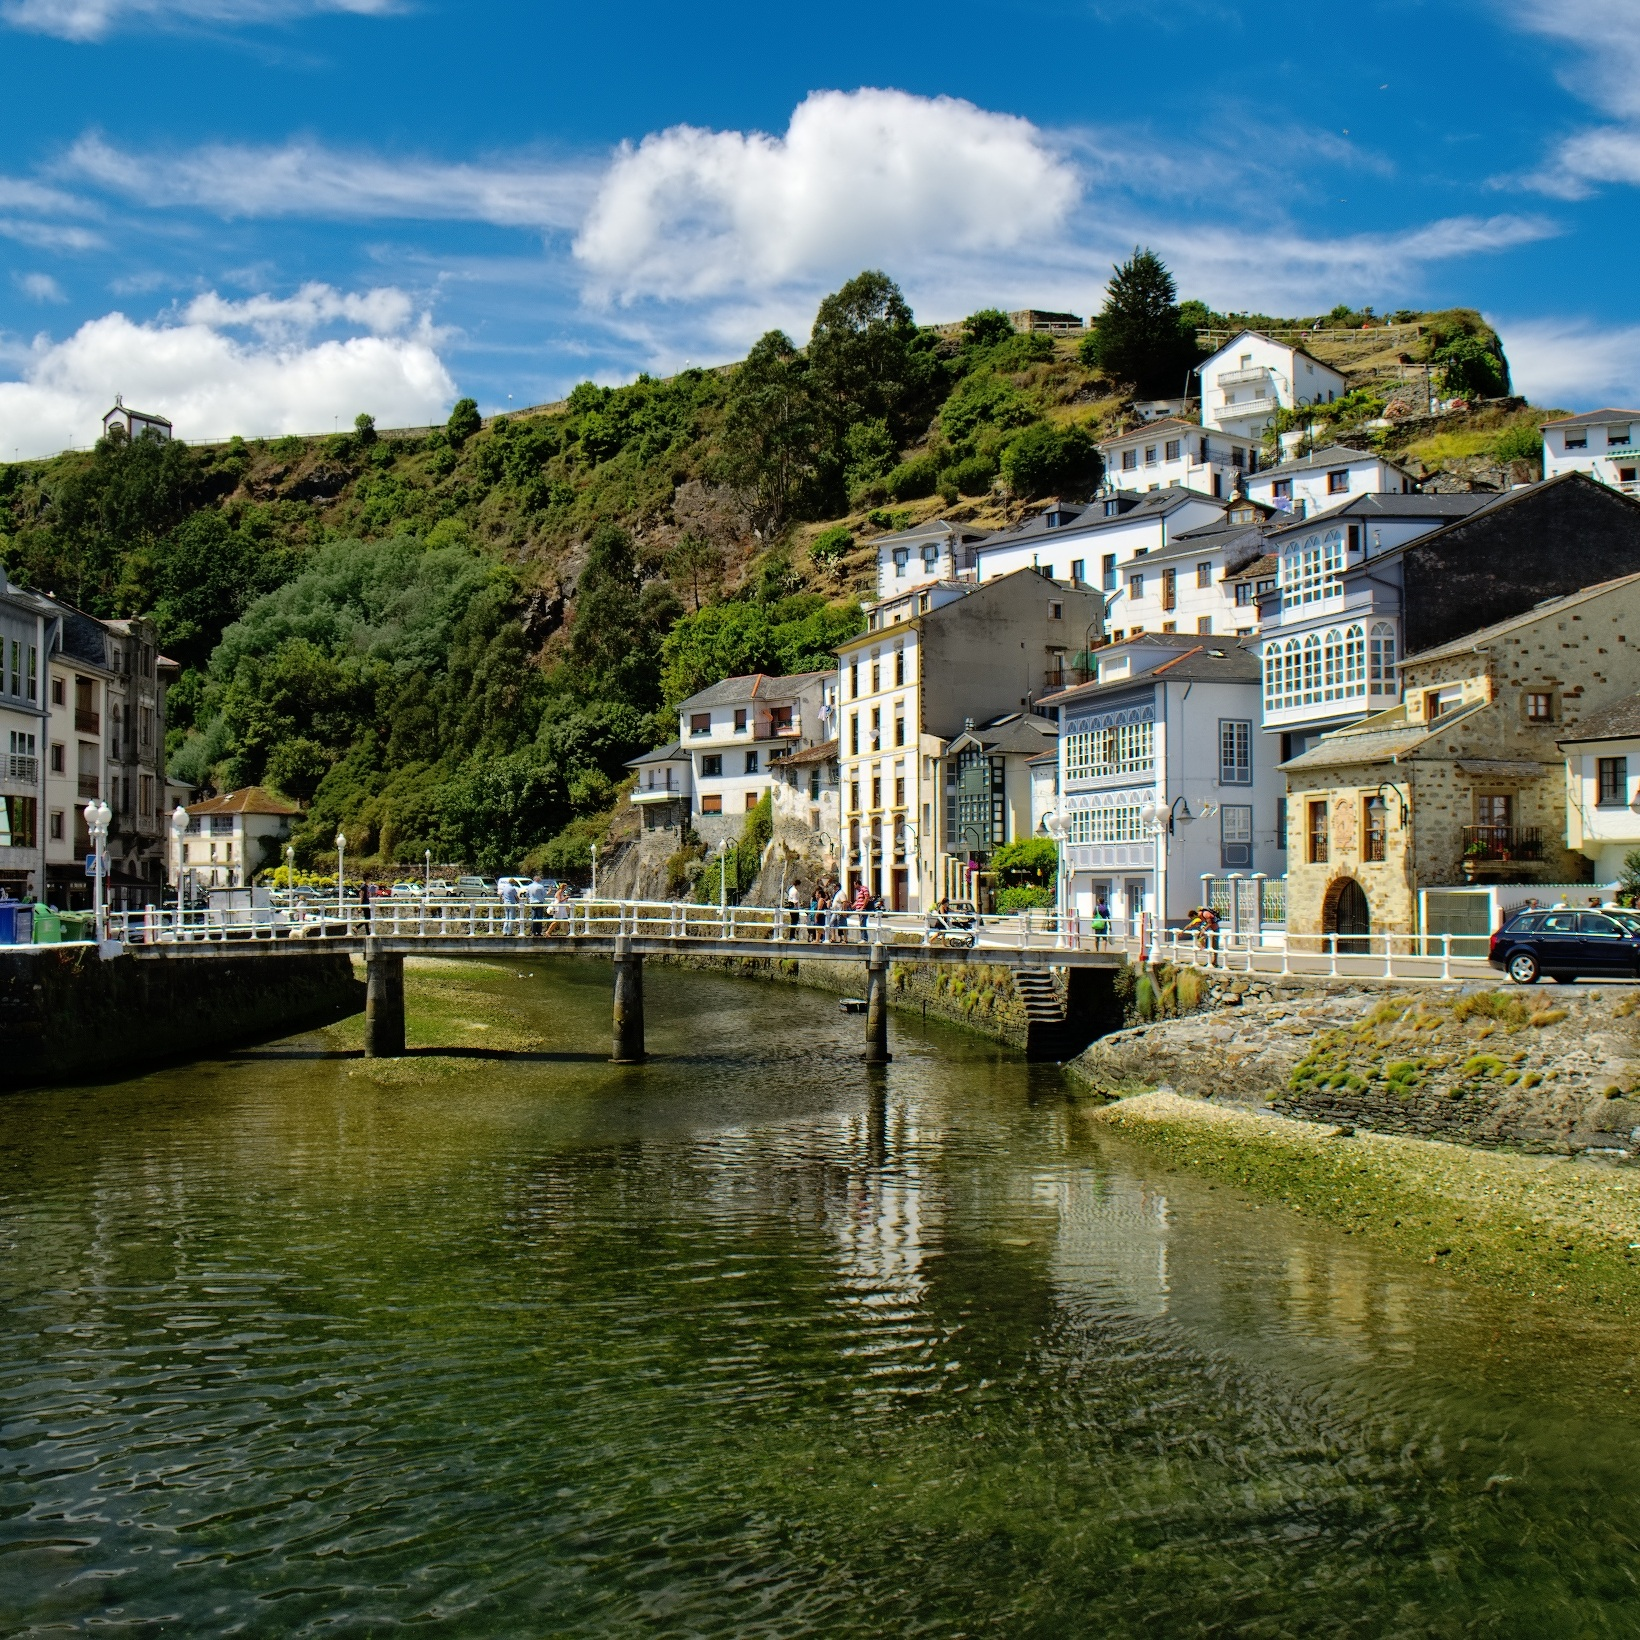 Auxiliares de Conversación Facebook Group: Asturias